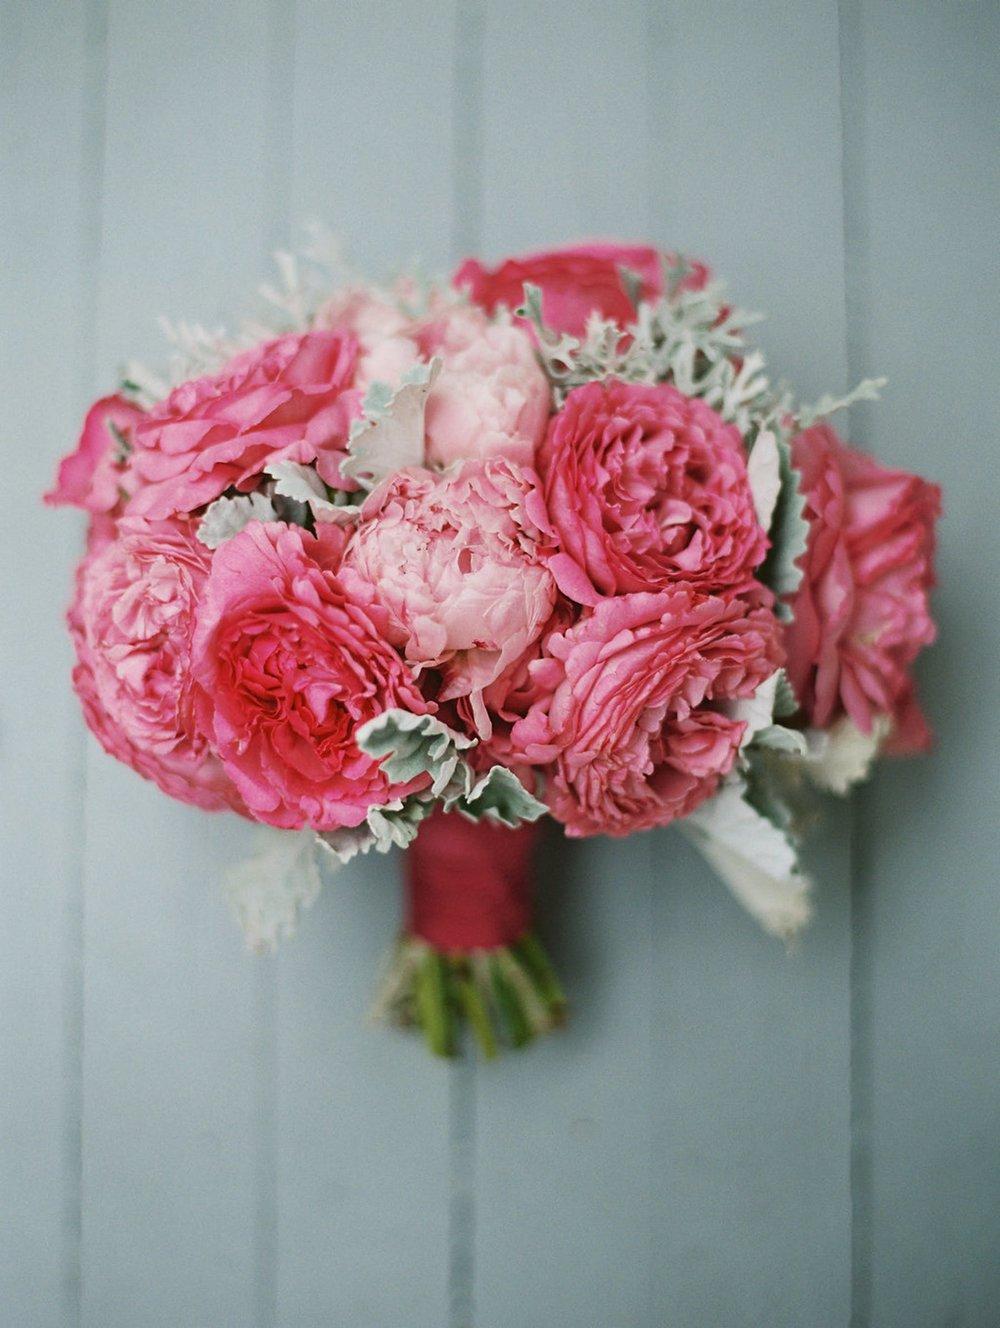 www.santabarbarawedding.com | El Encanto | Coco Rose Design | This Modern Romance | Bridal Bouquet